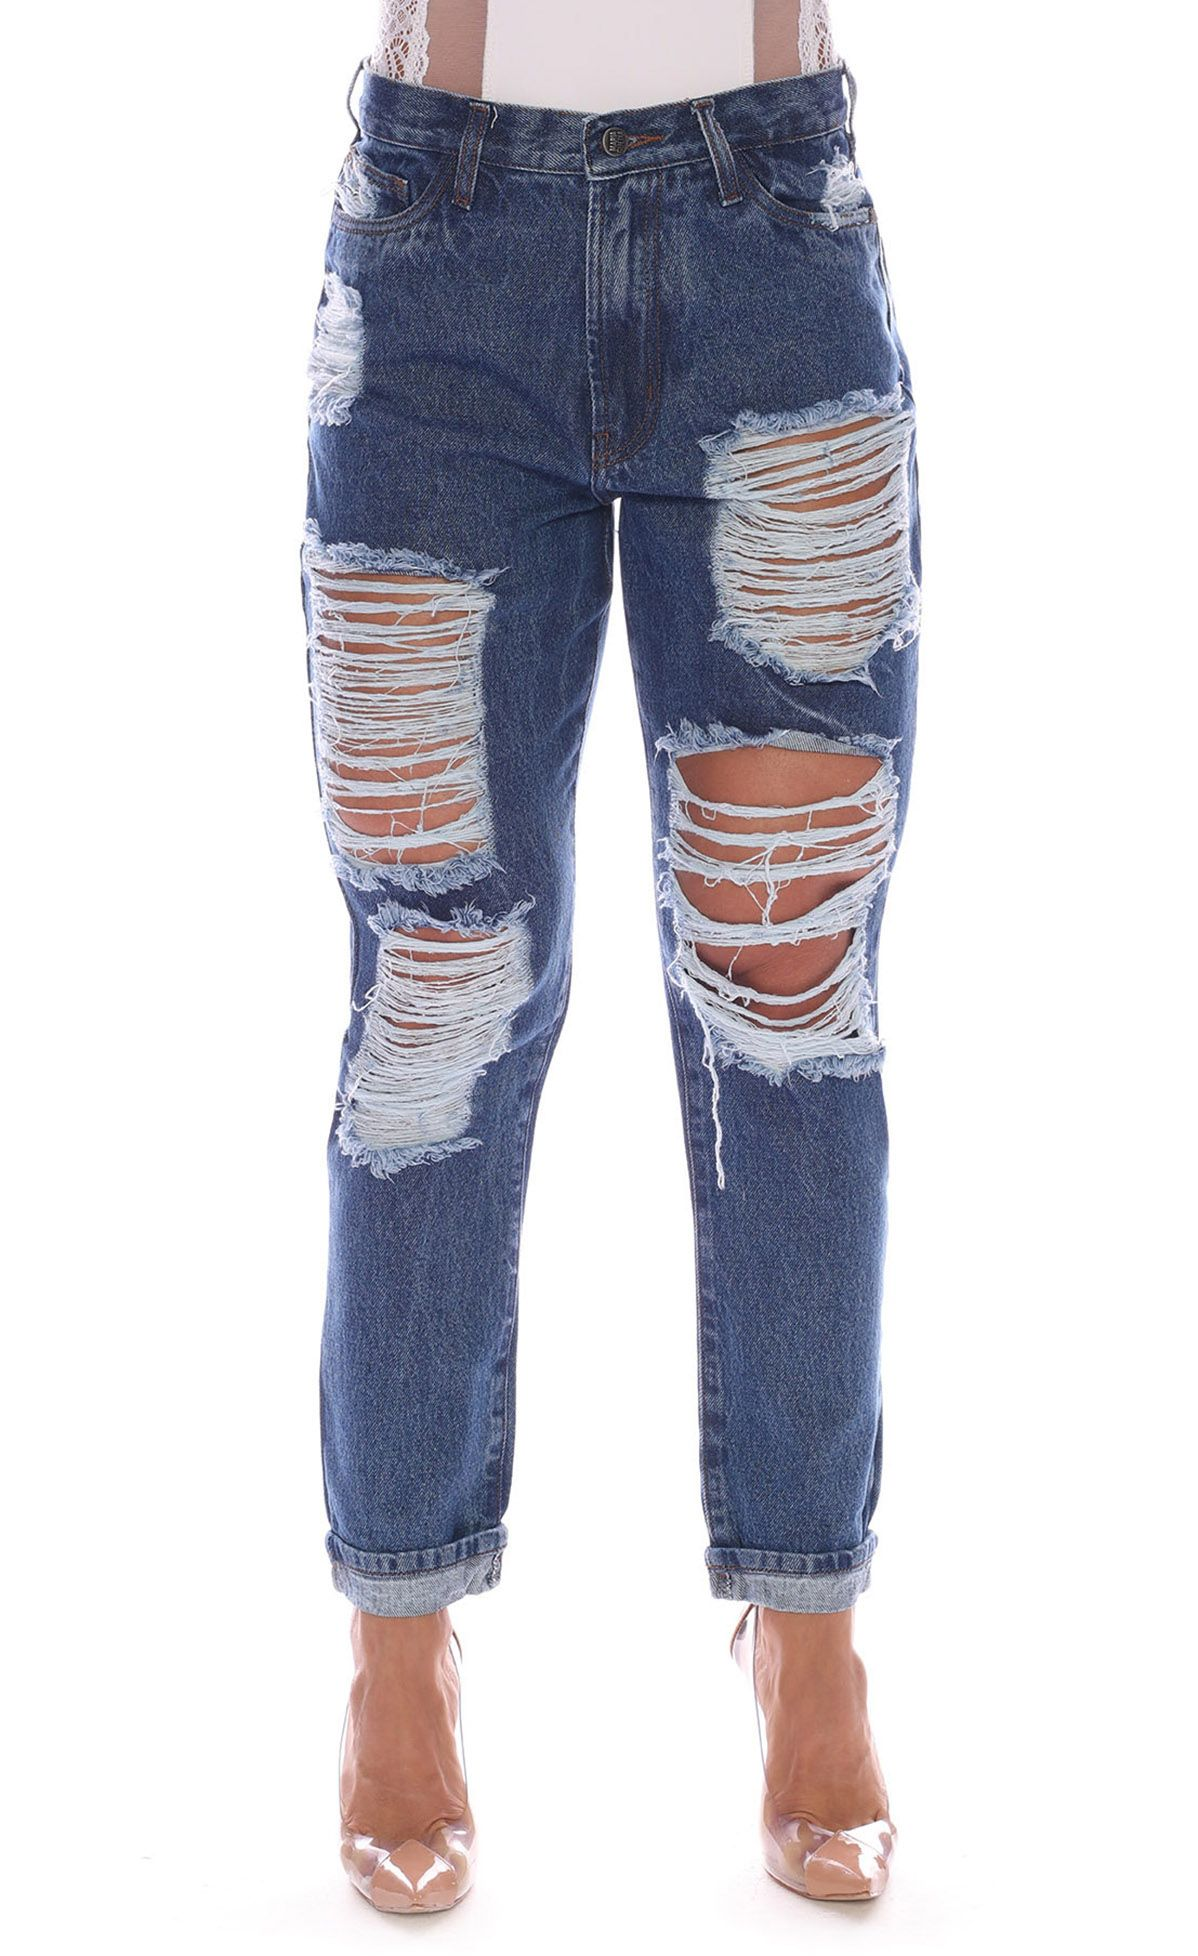 Calça Jeans Destroyed Azul Maria Gueixa Jeans